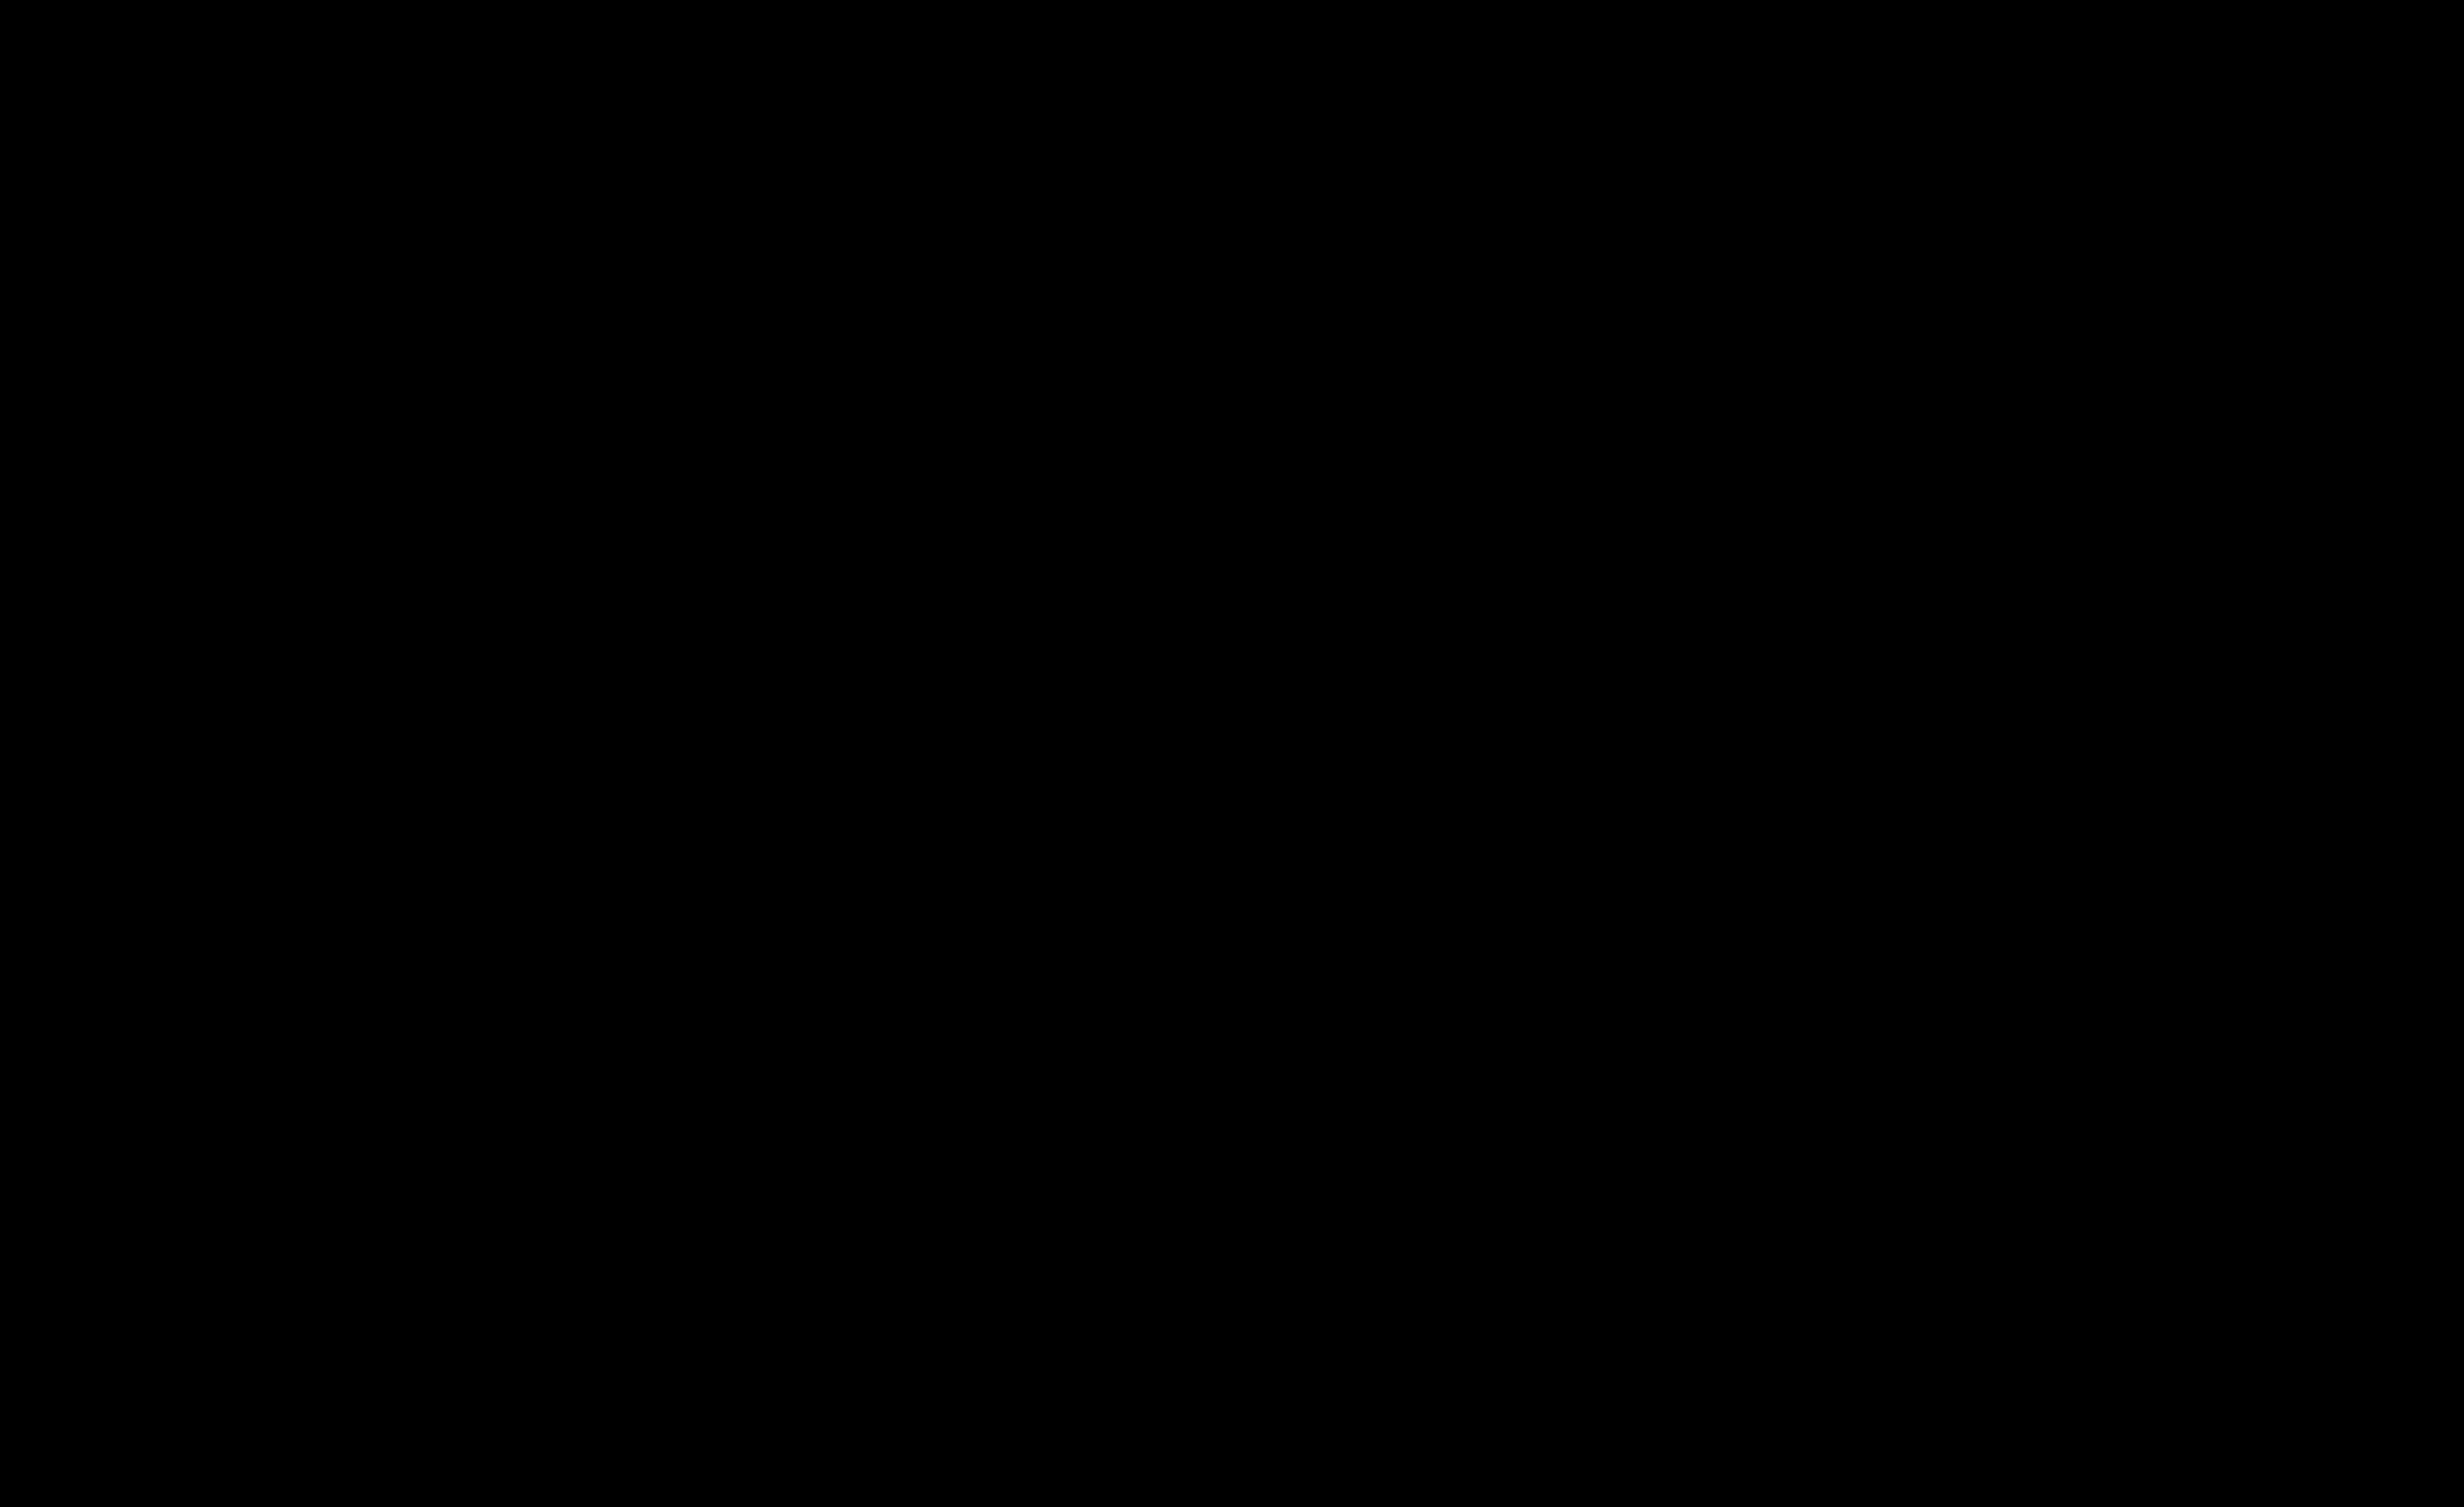 Single Music Notes Symbols - ClipArt Best